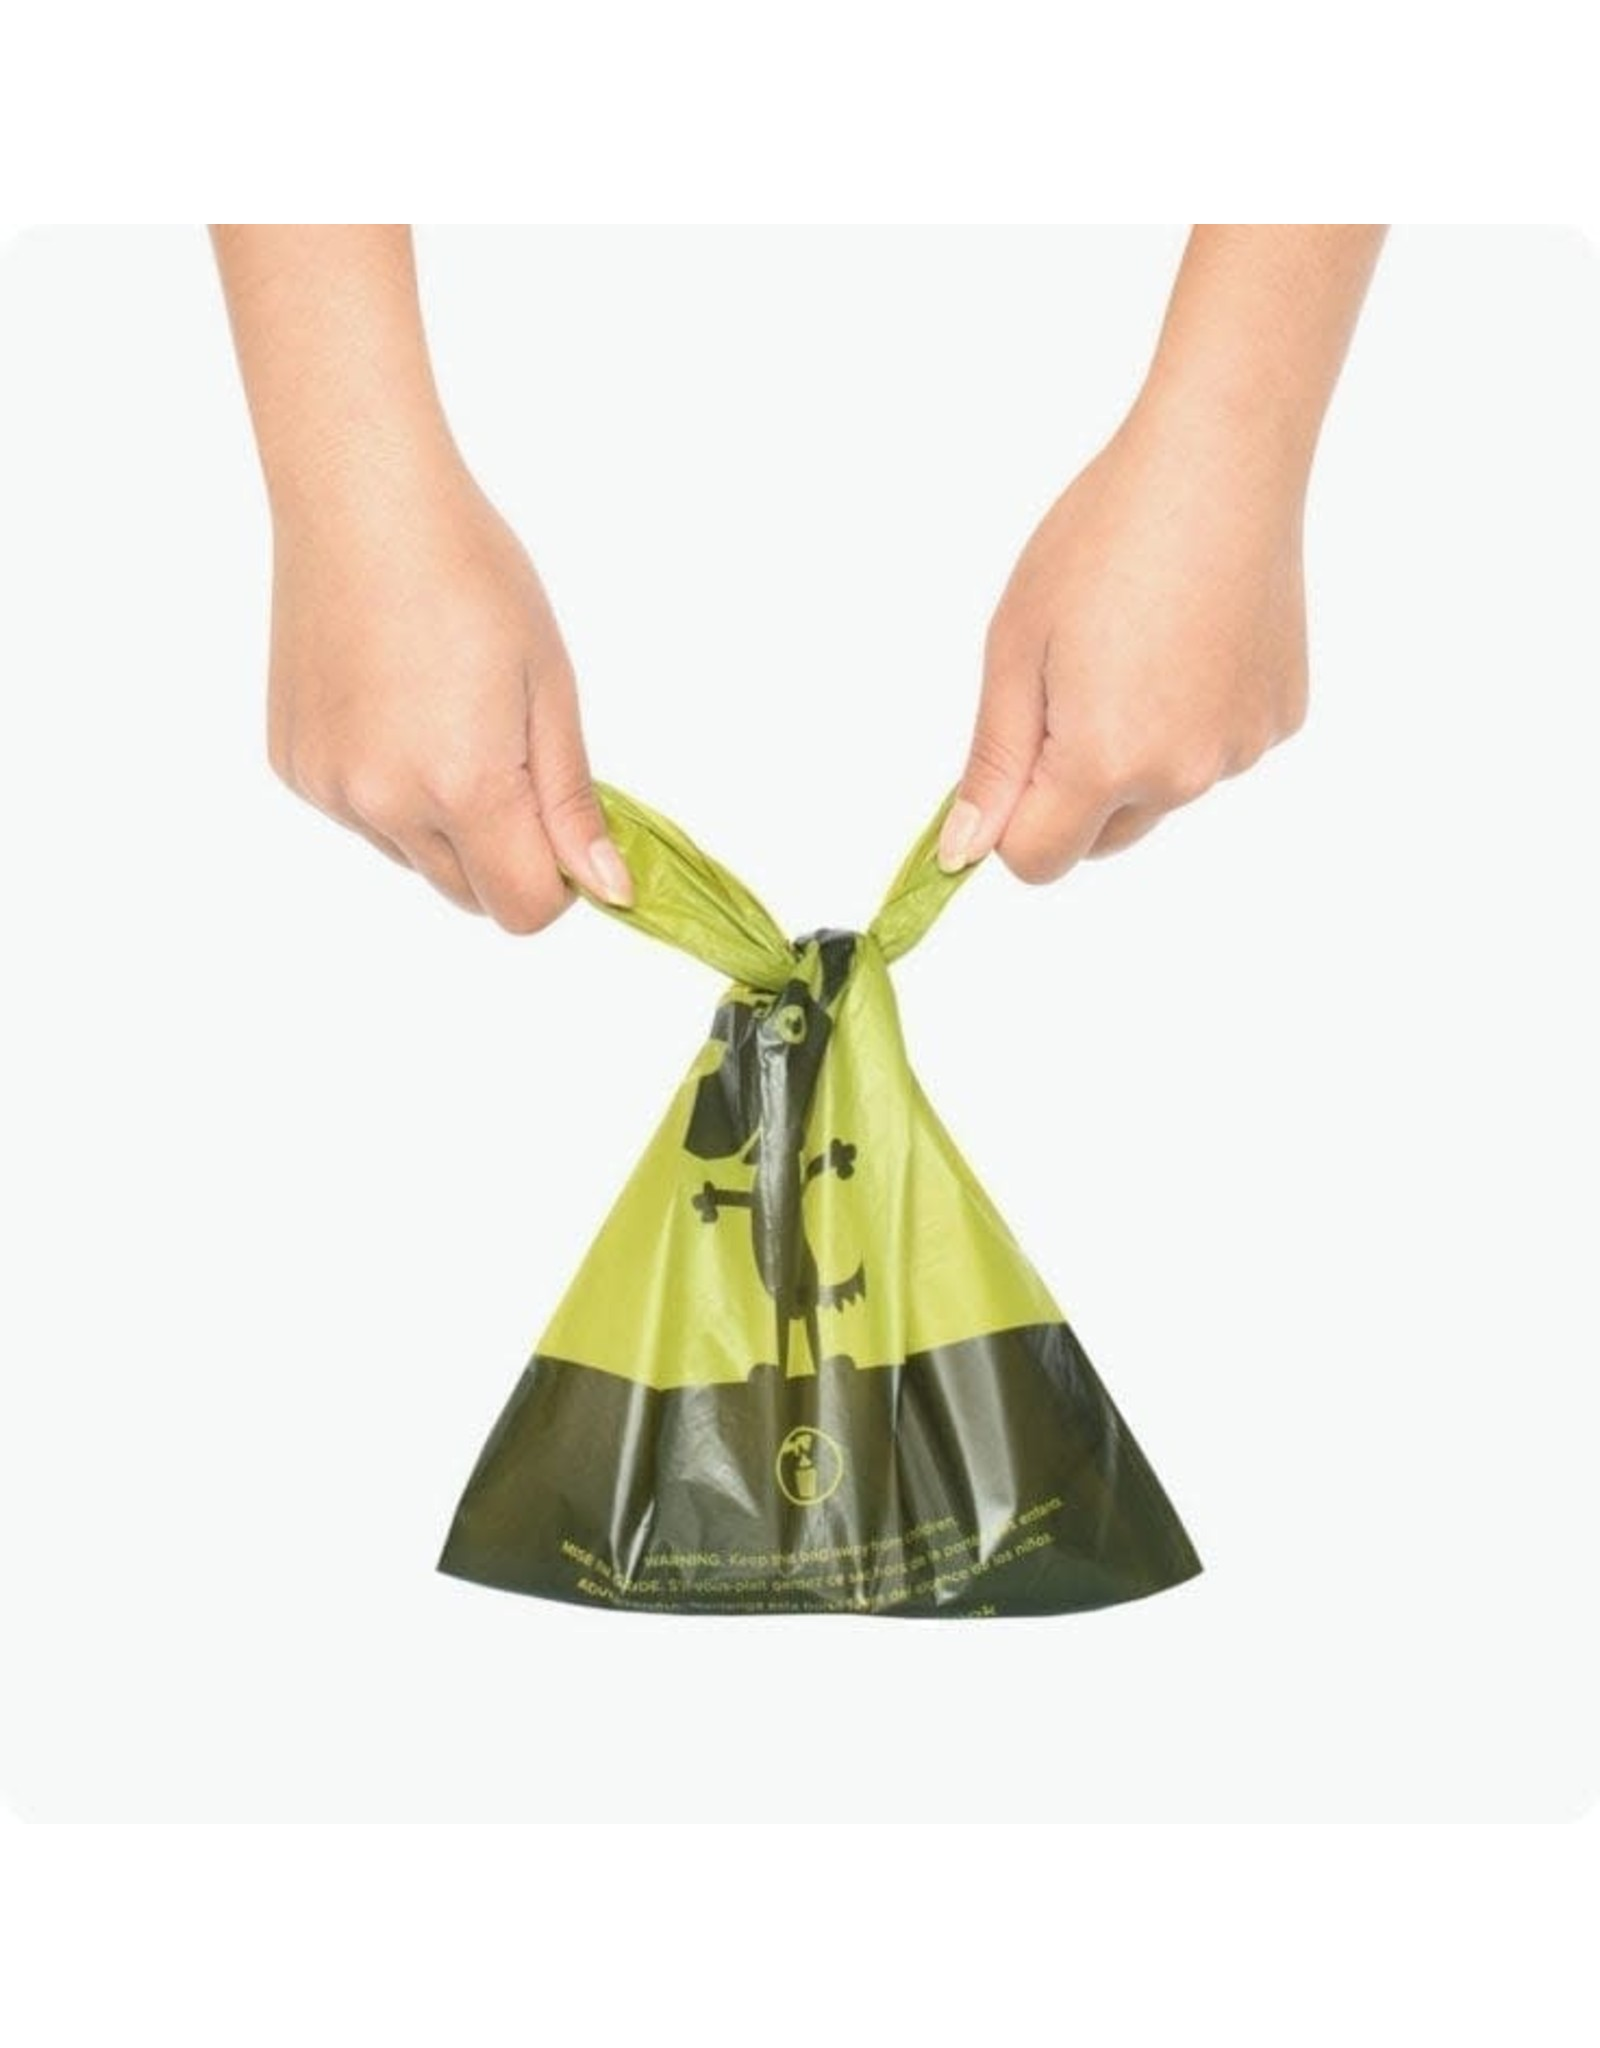 120 Easy-Tie Handle Bags - Lavender Scented